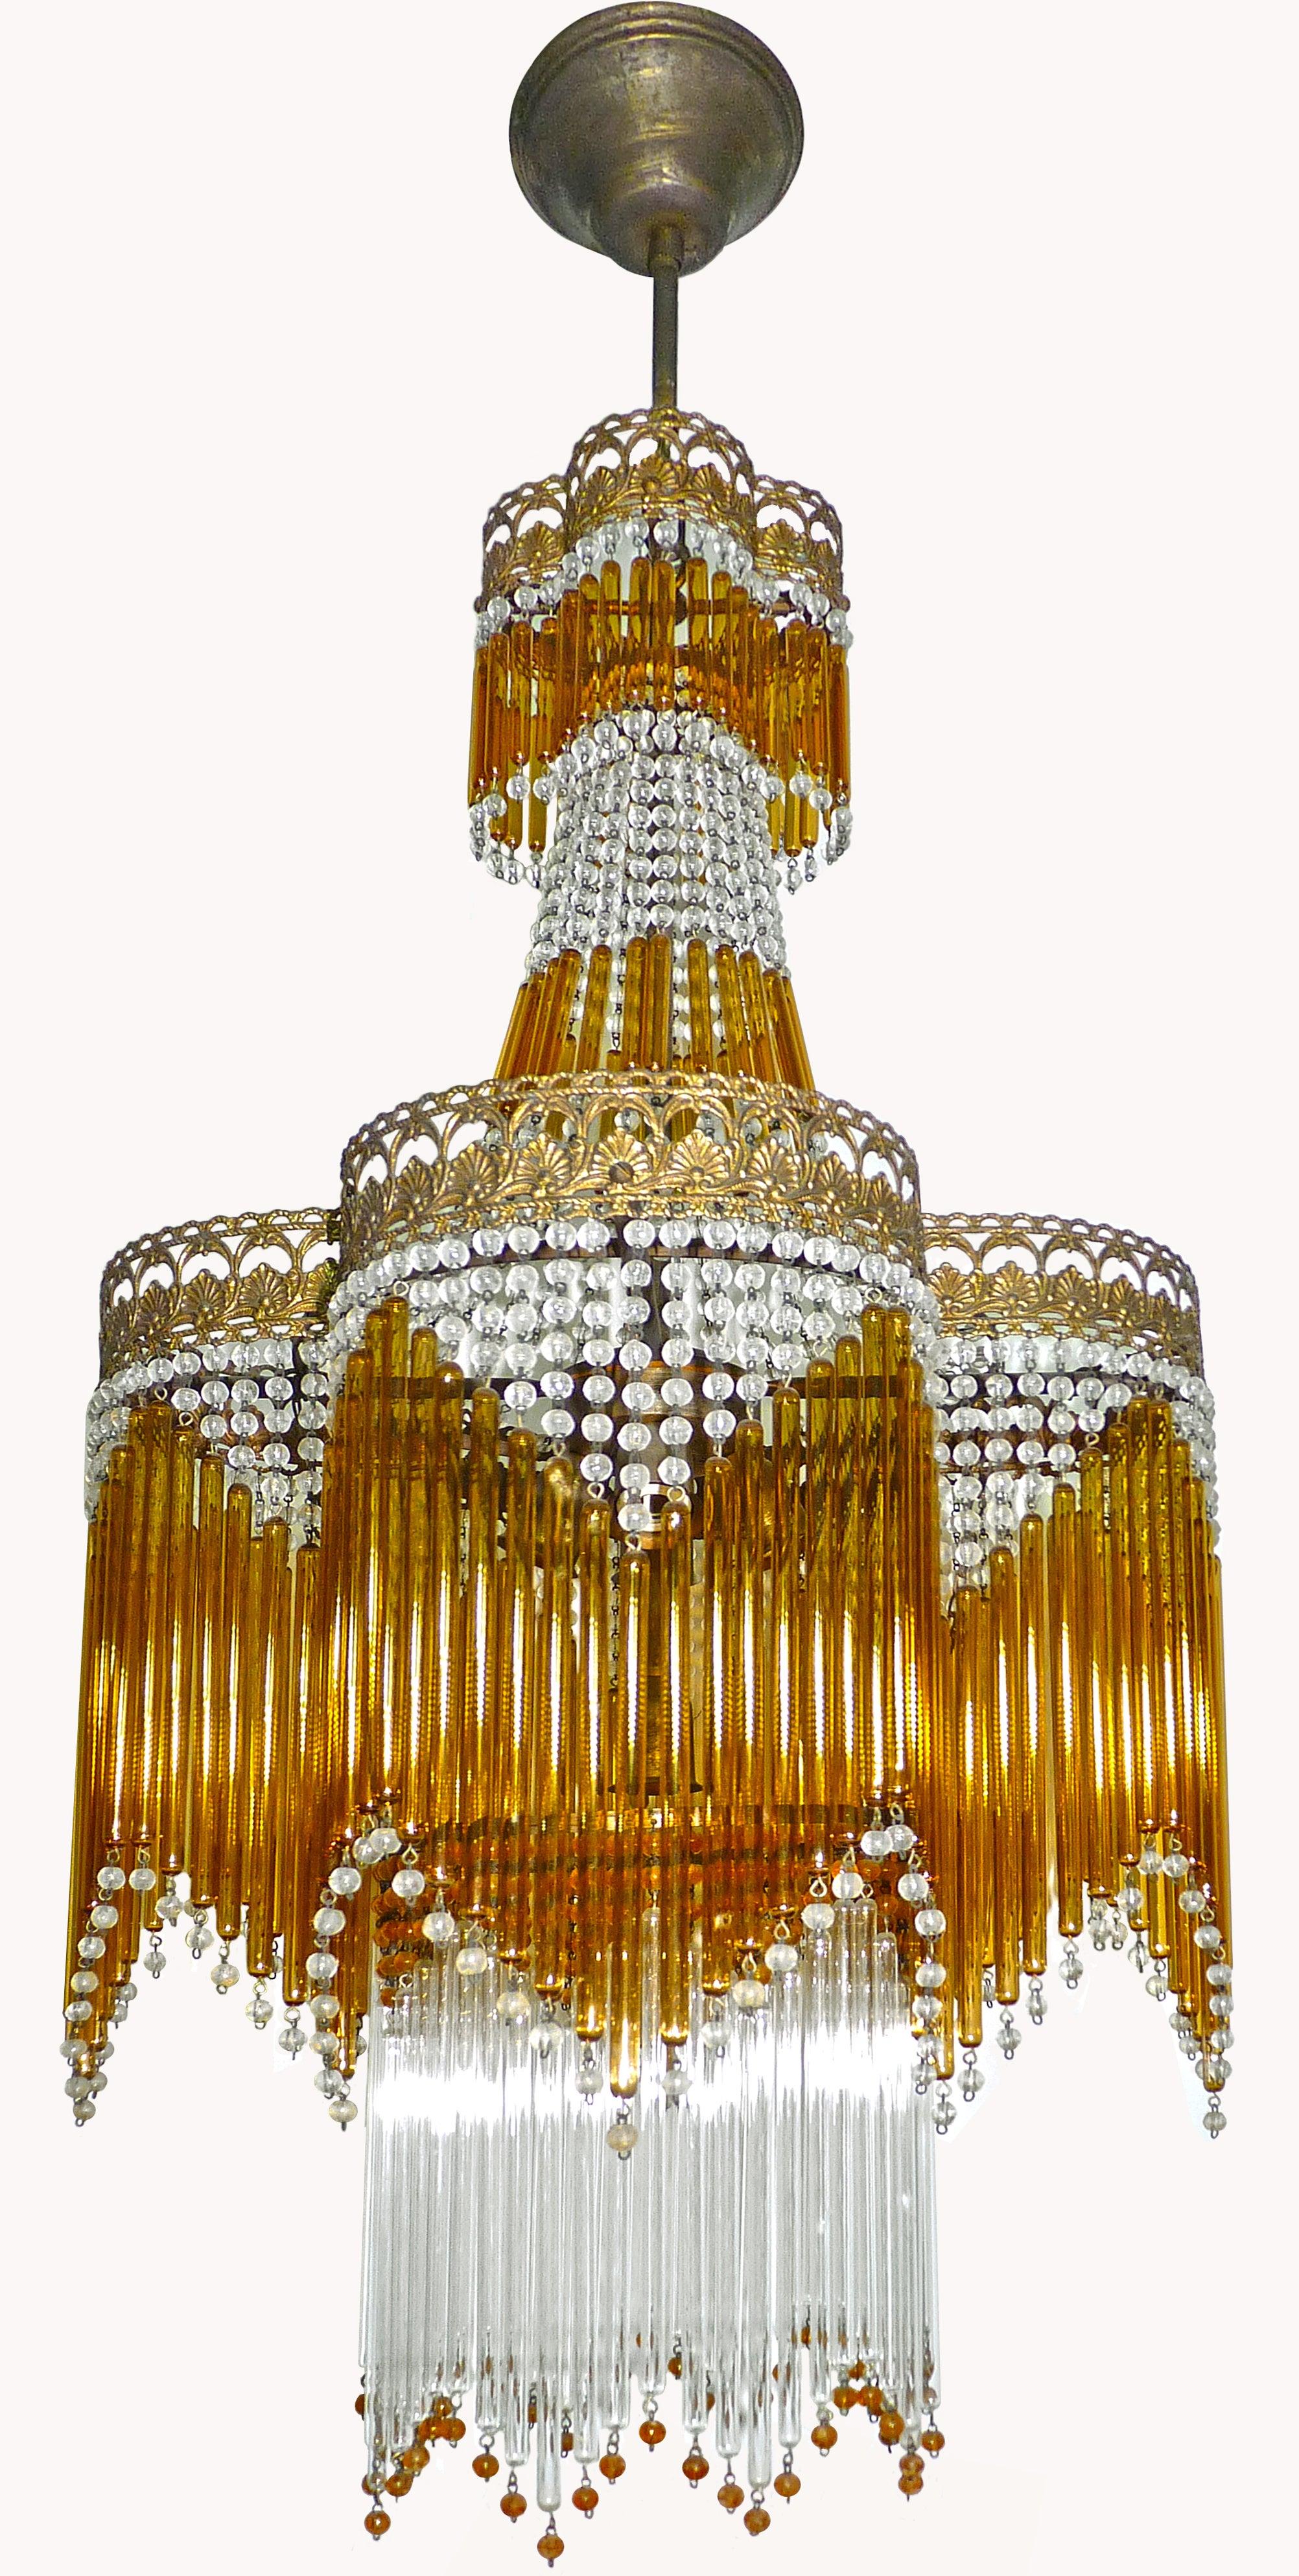 jean hero murano art vintage chandelier fray glass deco jmf marc ballroom product